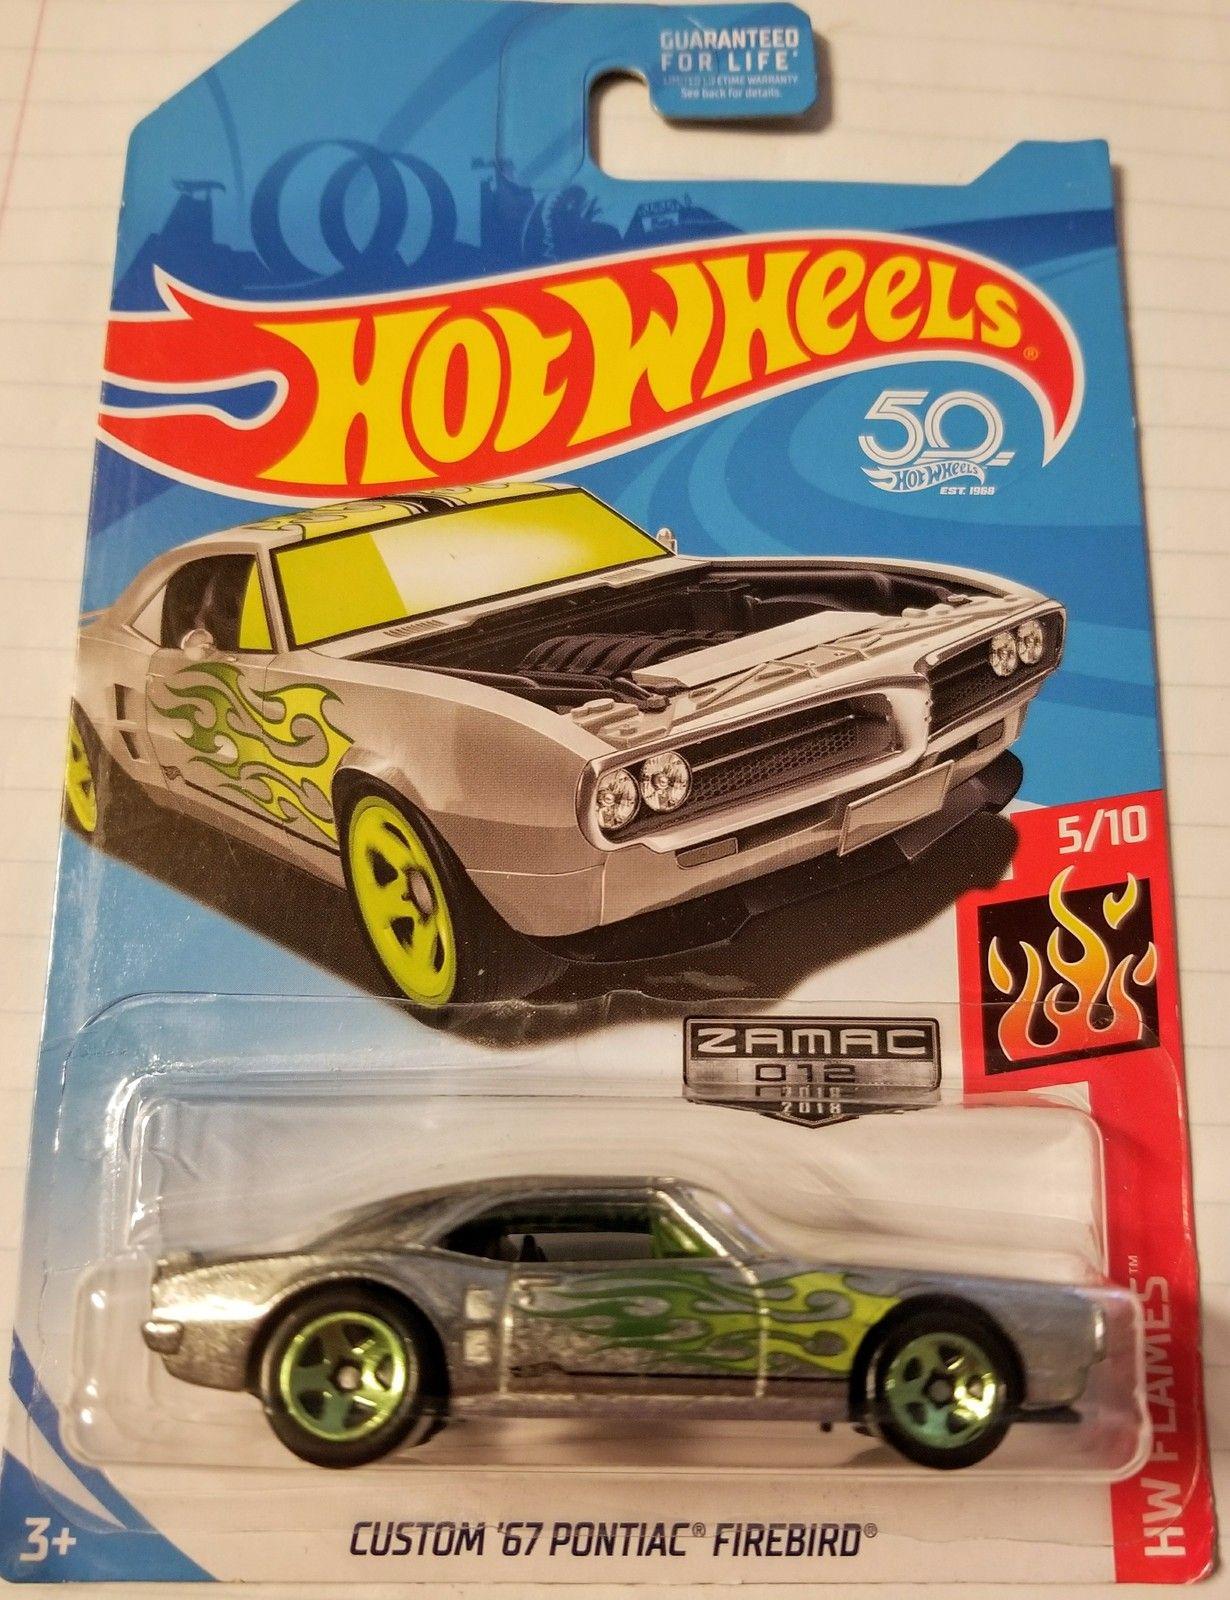 Hot Wheels 50th Anniversary Hw Flames Custom 67 Pontiac Firebird Hotwheels 2016 Bmw M2 Biru Zamac